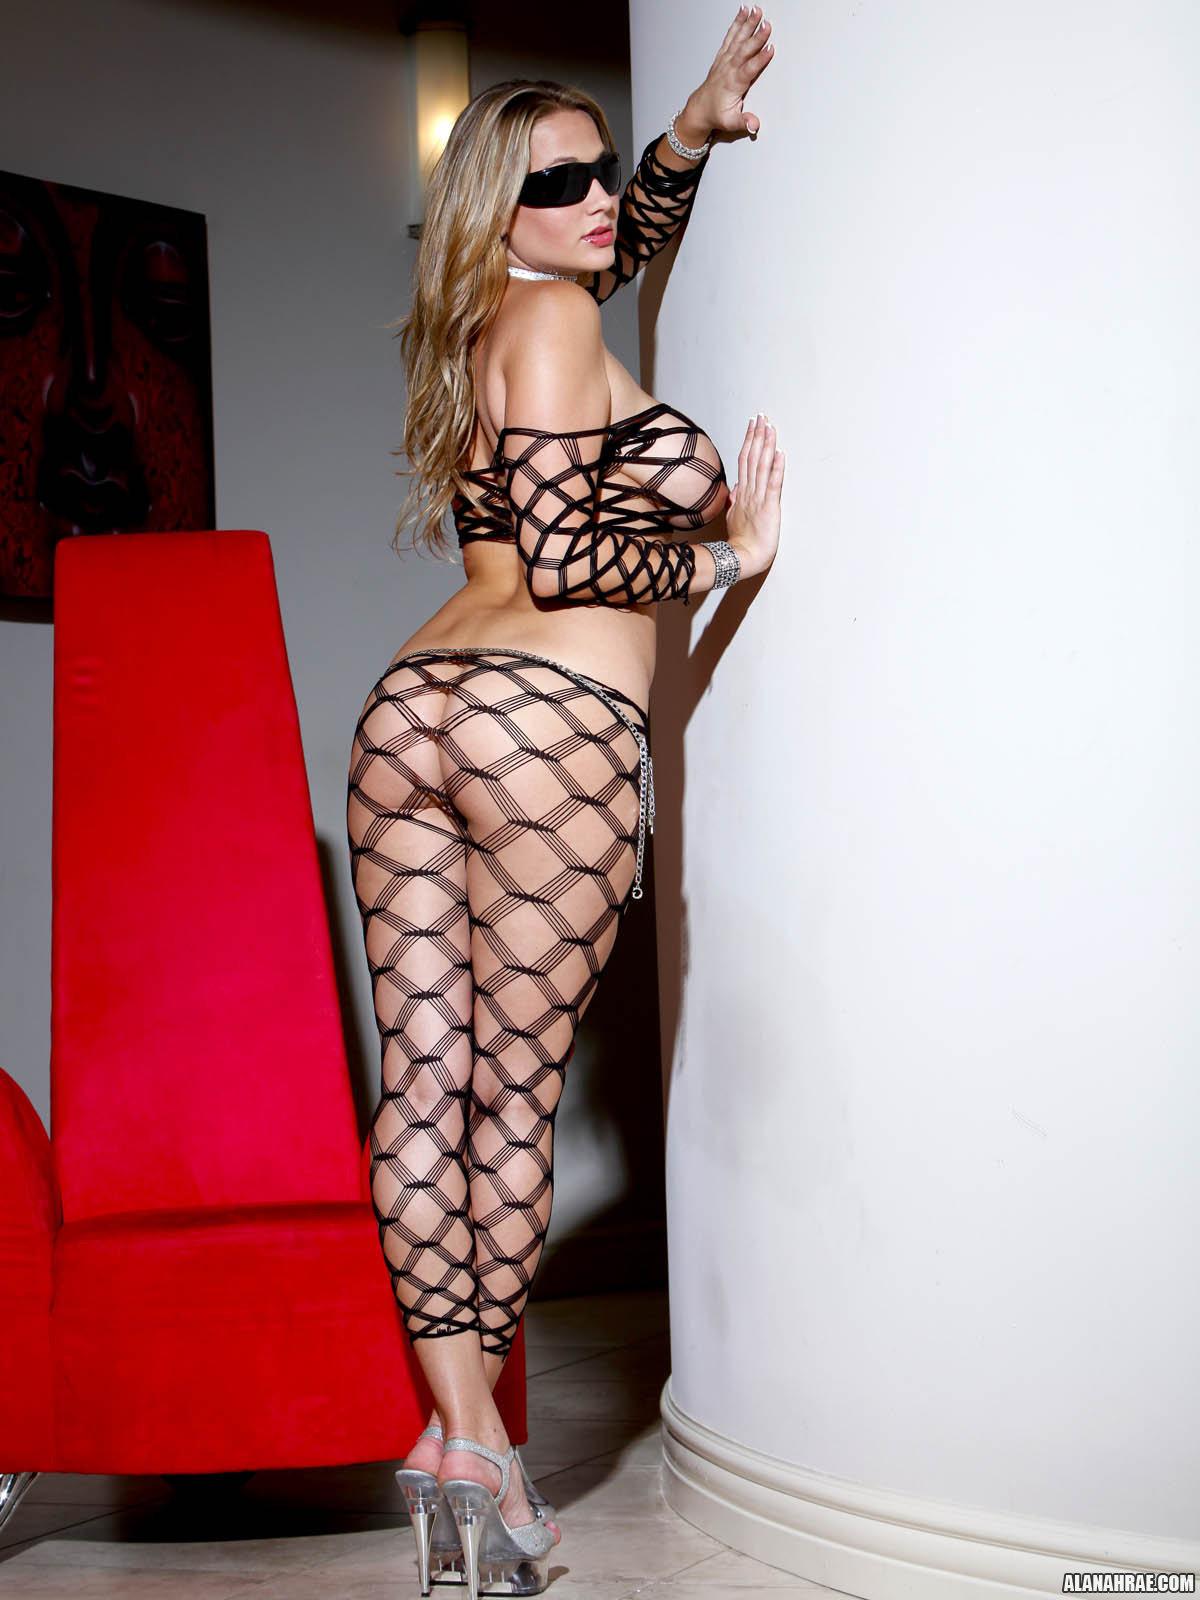 Alanah Rae Porn Star Real Name alanah rae - free pics, videos & biography